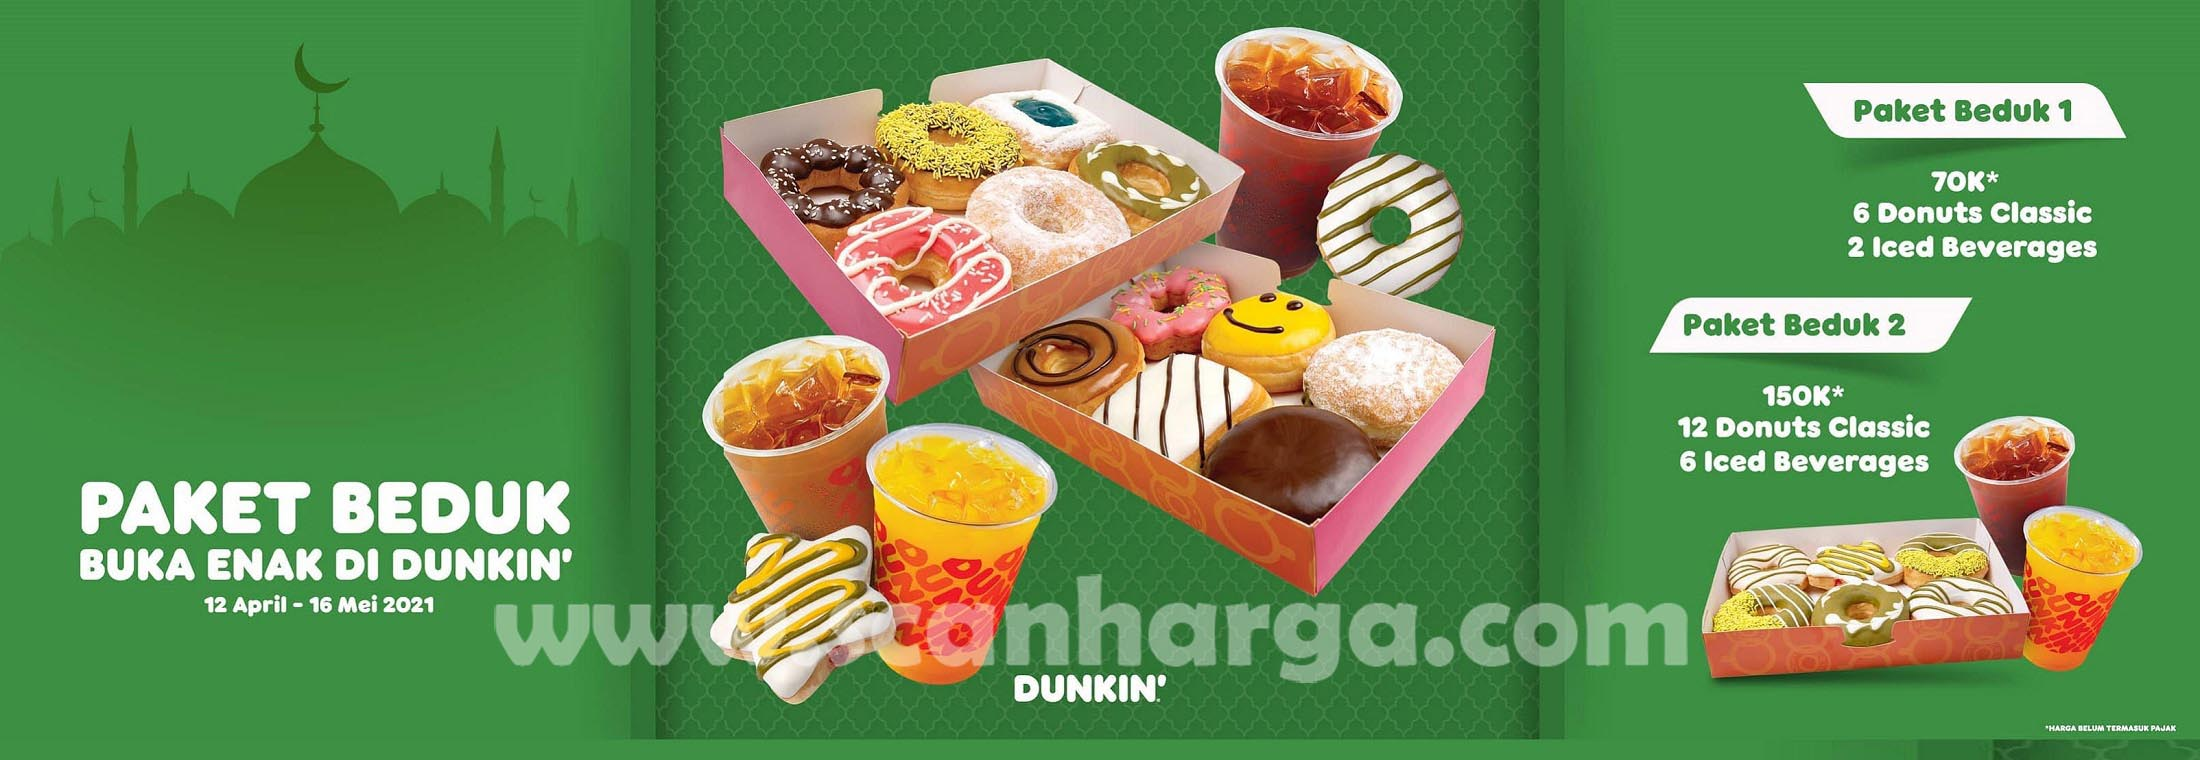 Promo Dunkin Donuts Terbaru 12 April - 16 Mei 2021